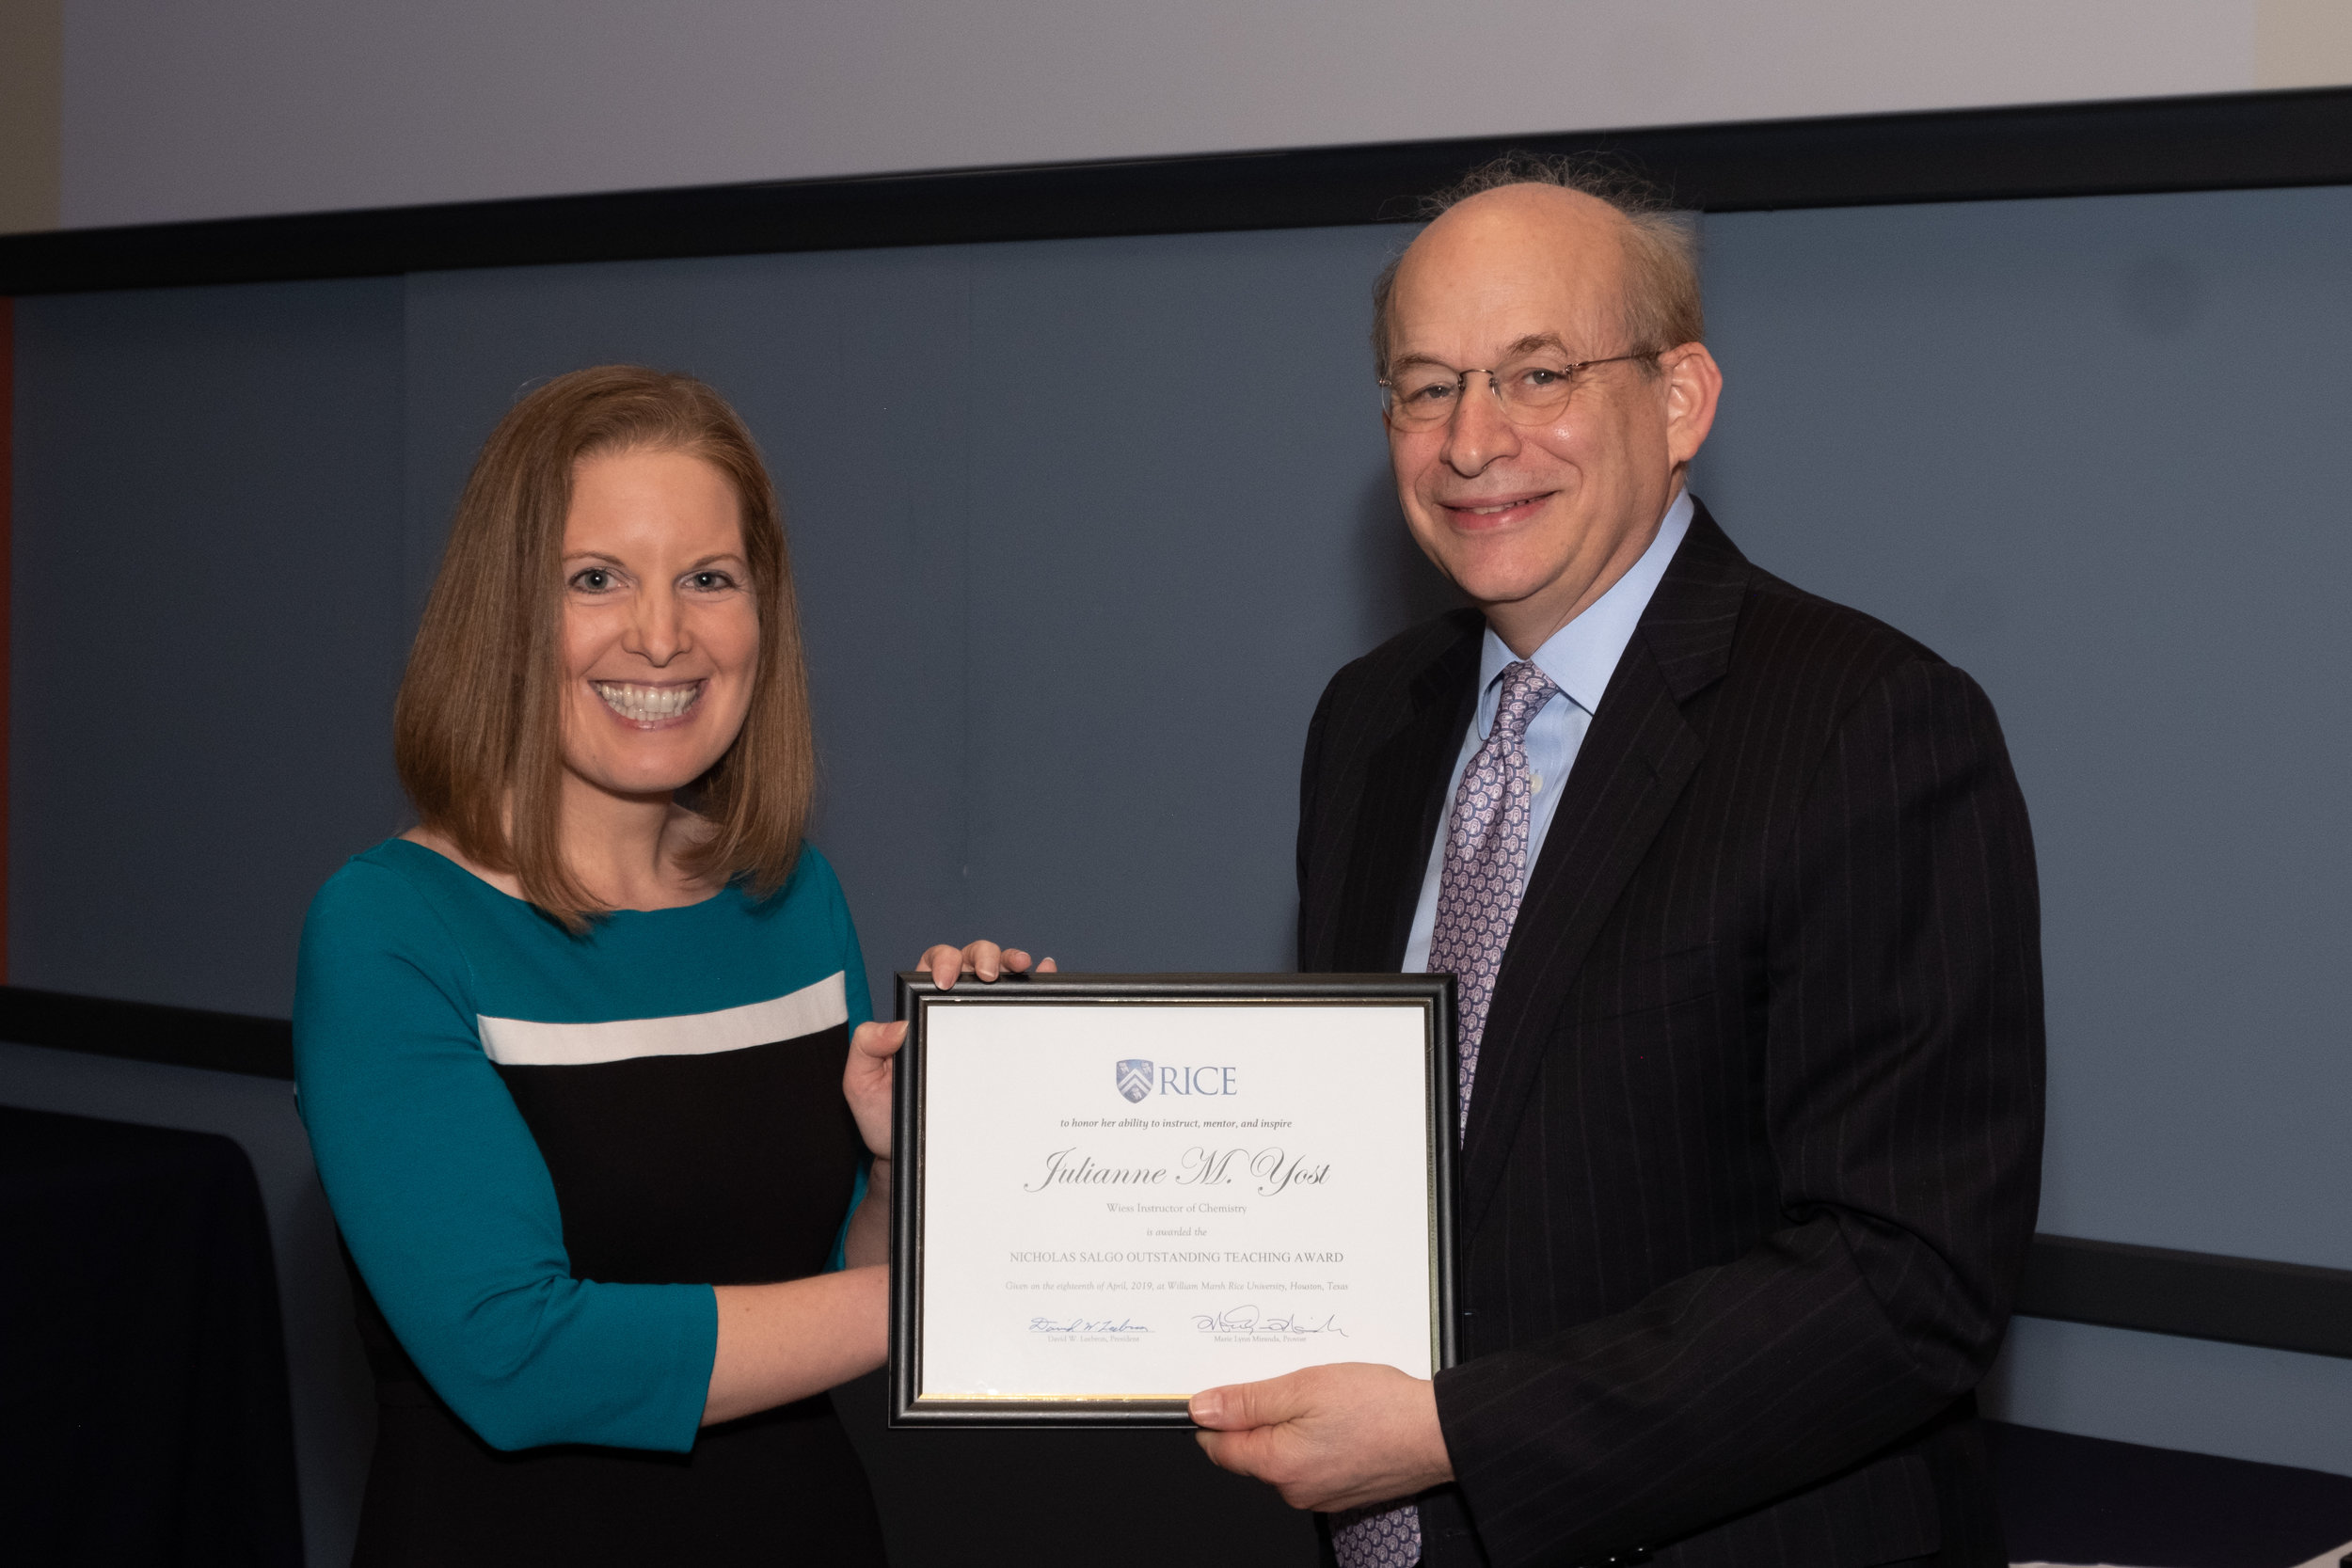 President Leebron & Julianne Yost, Nicolas Salgo Outstanding Teaching Award